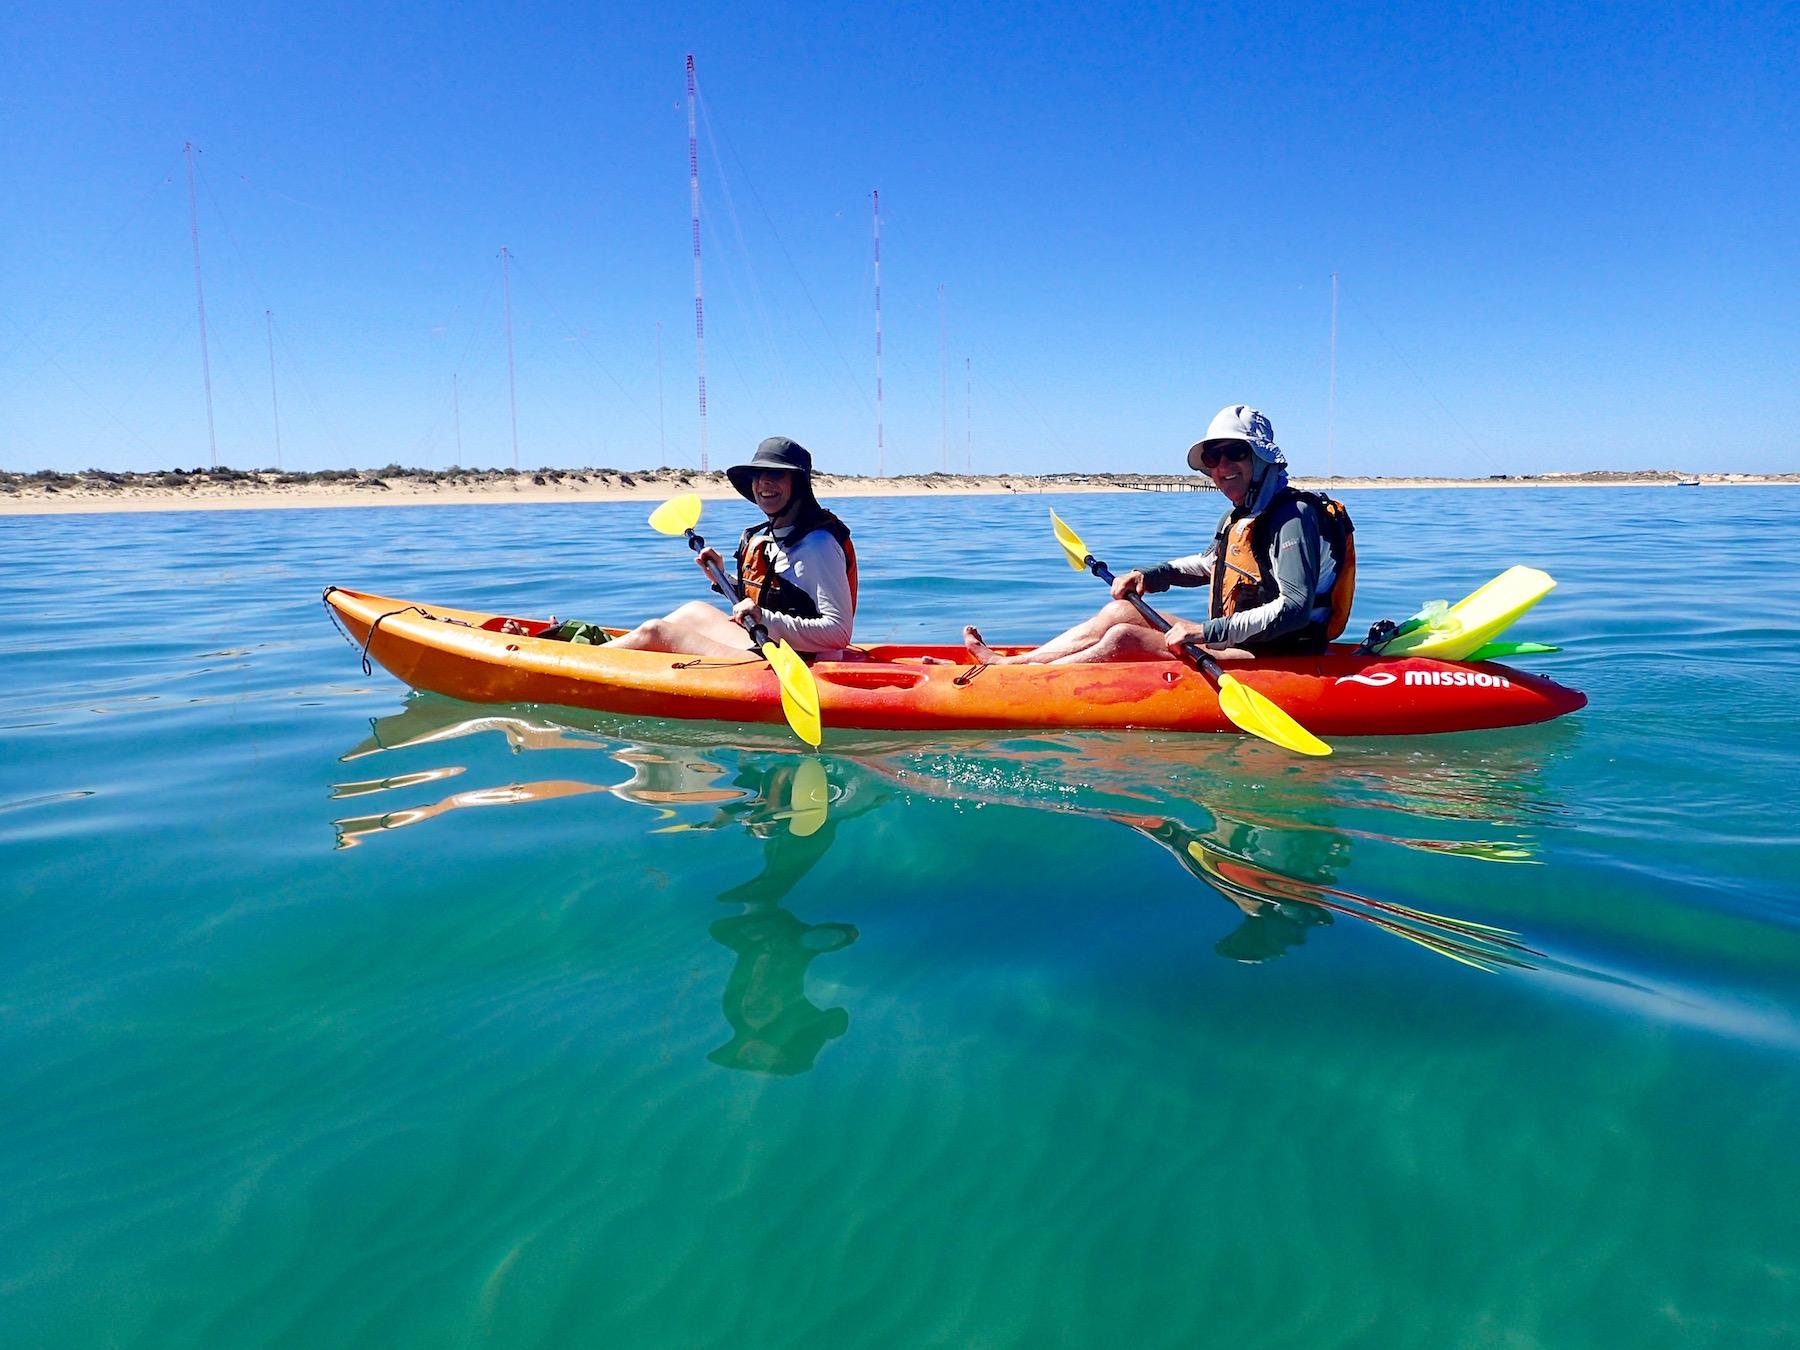 Arvo Cruiser, sea kayak, snorkel, eco tour, Exmouth Adventure Co, Exmouth, Western Australia, Ningaloo Reef, coral coast